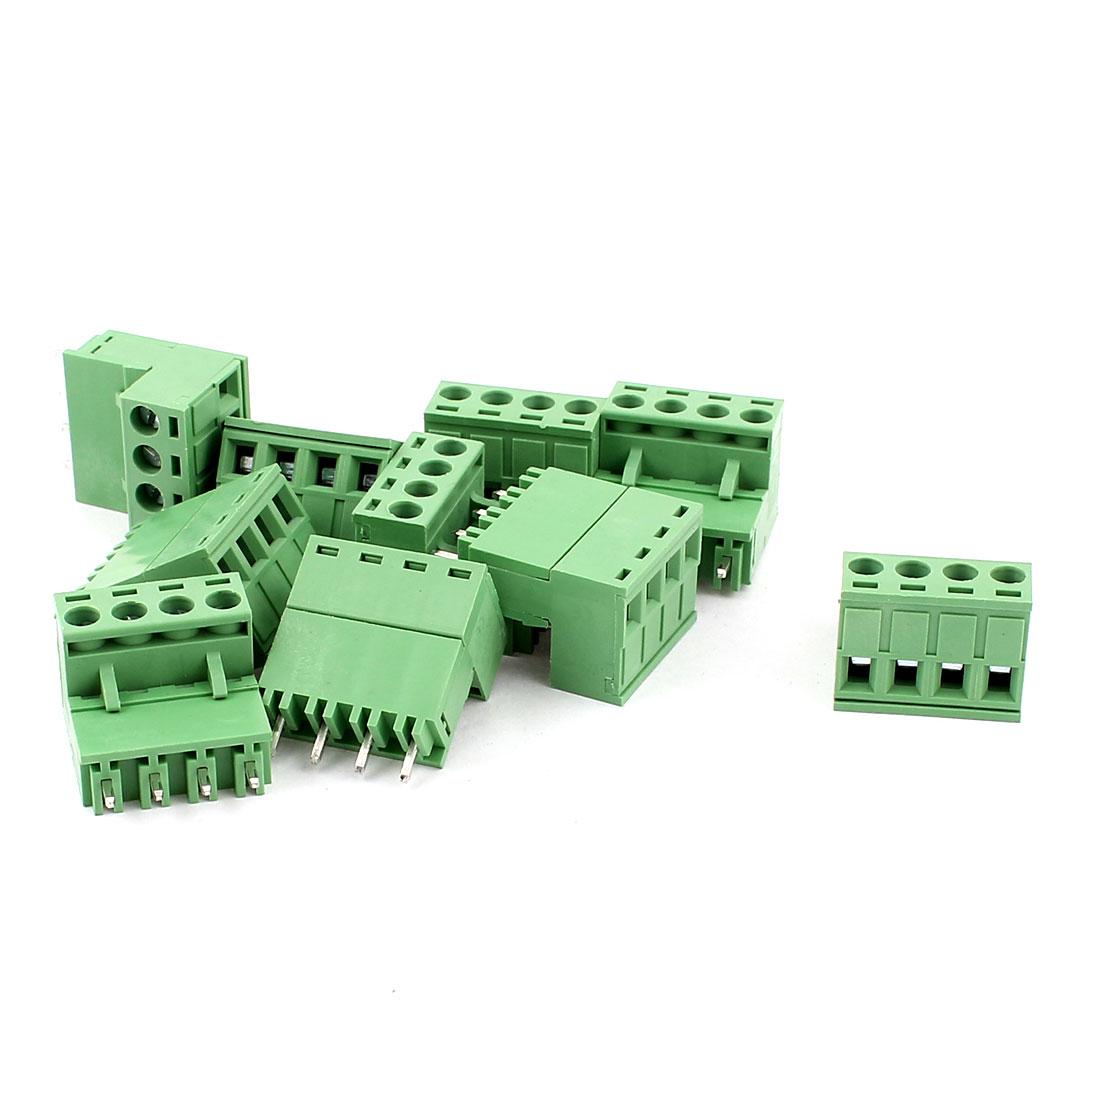 10 Pcs AC 300V 10A 4 Pins PCB Screw Terminal Block Connector 5.08mm Pitch Green